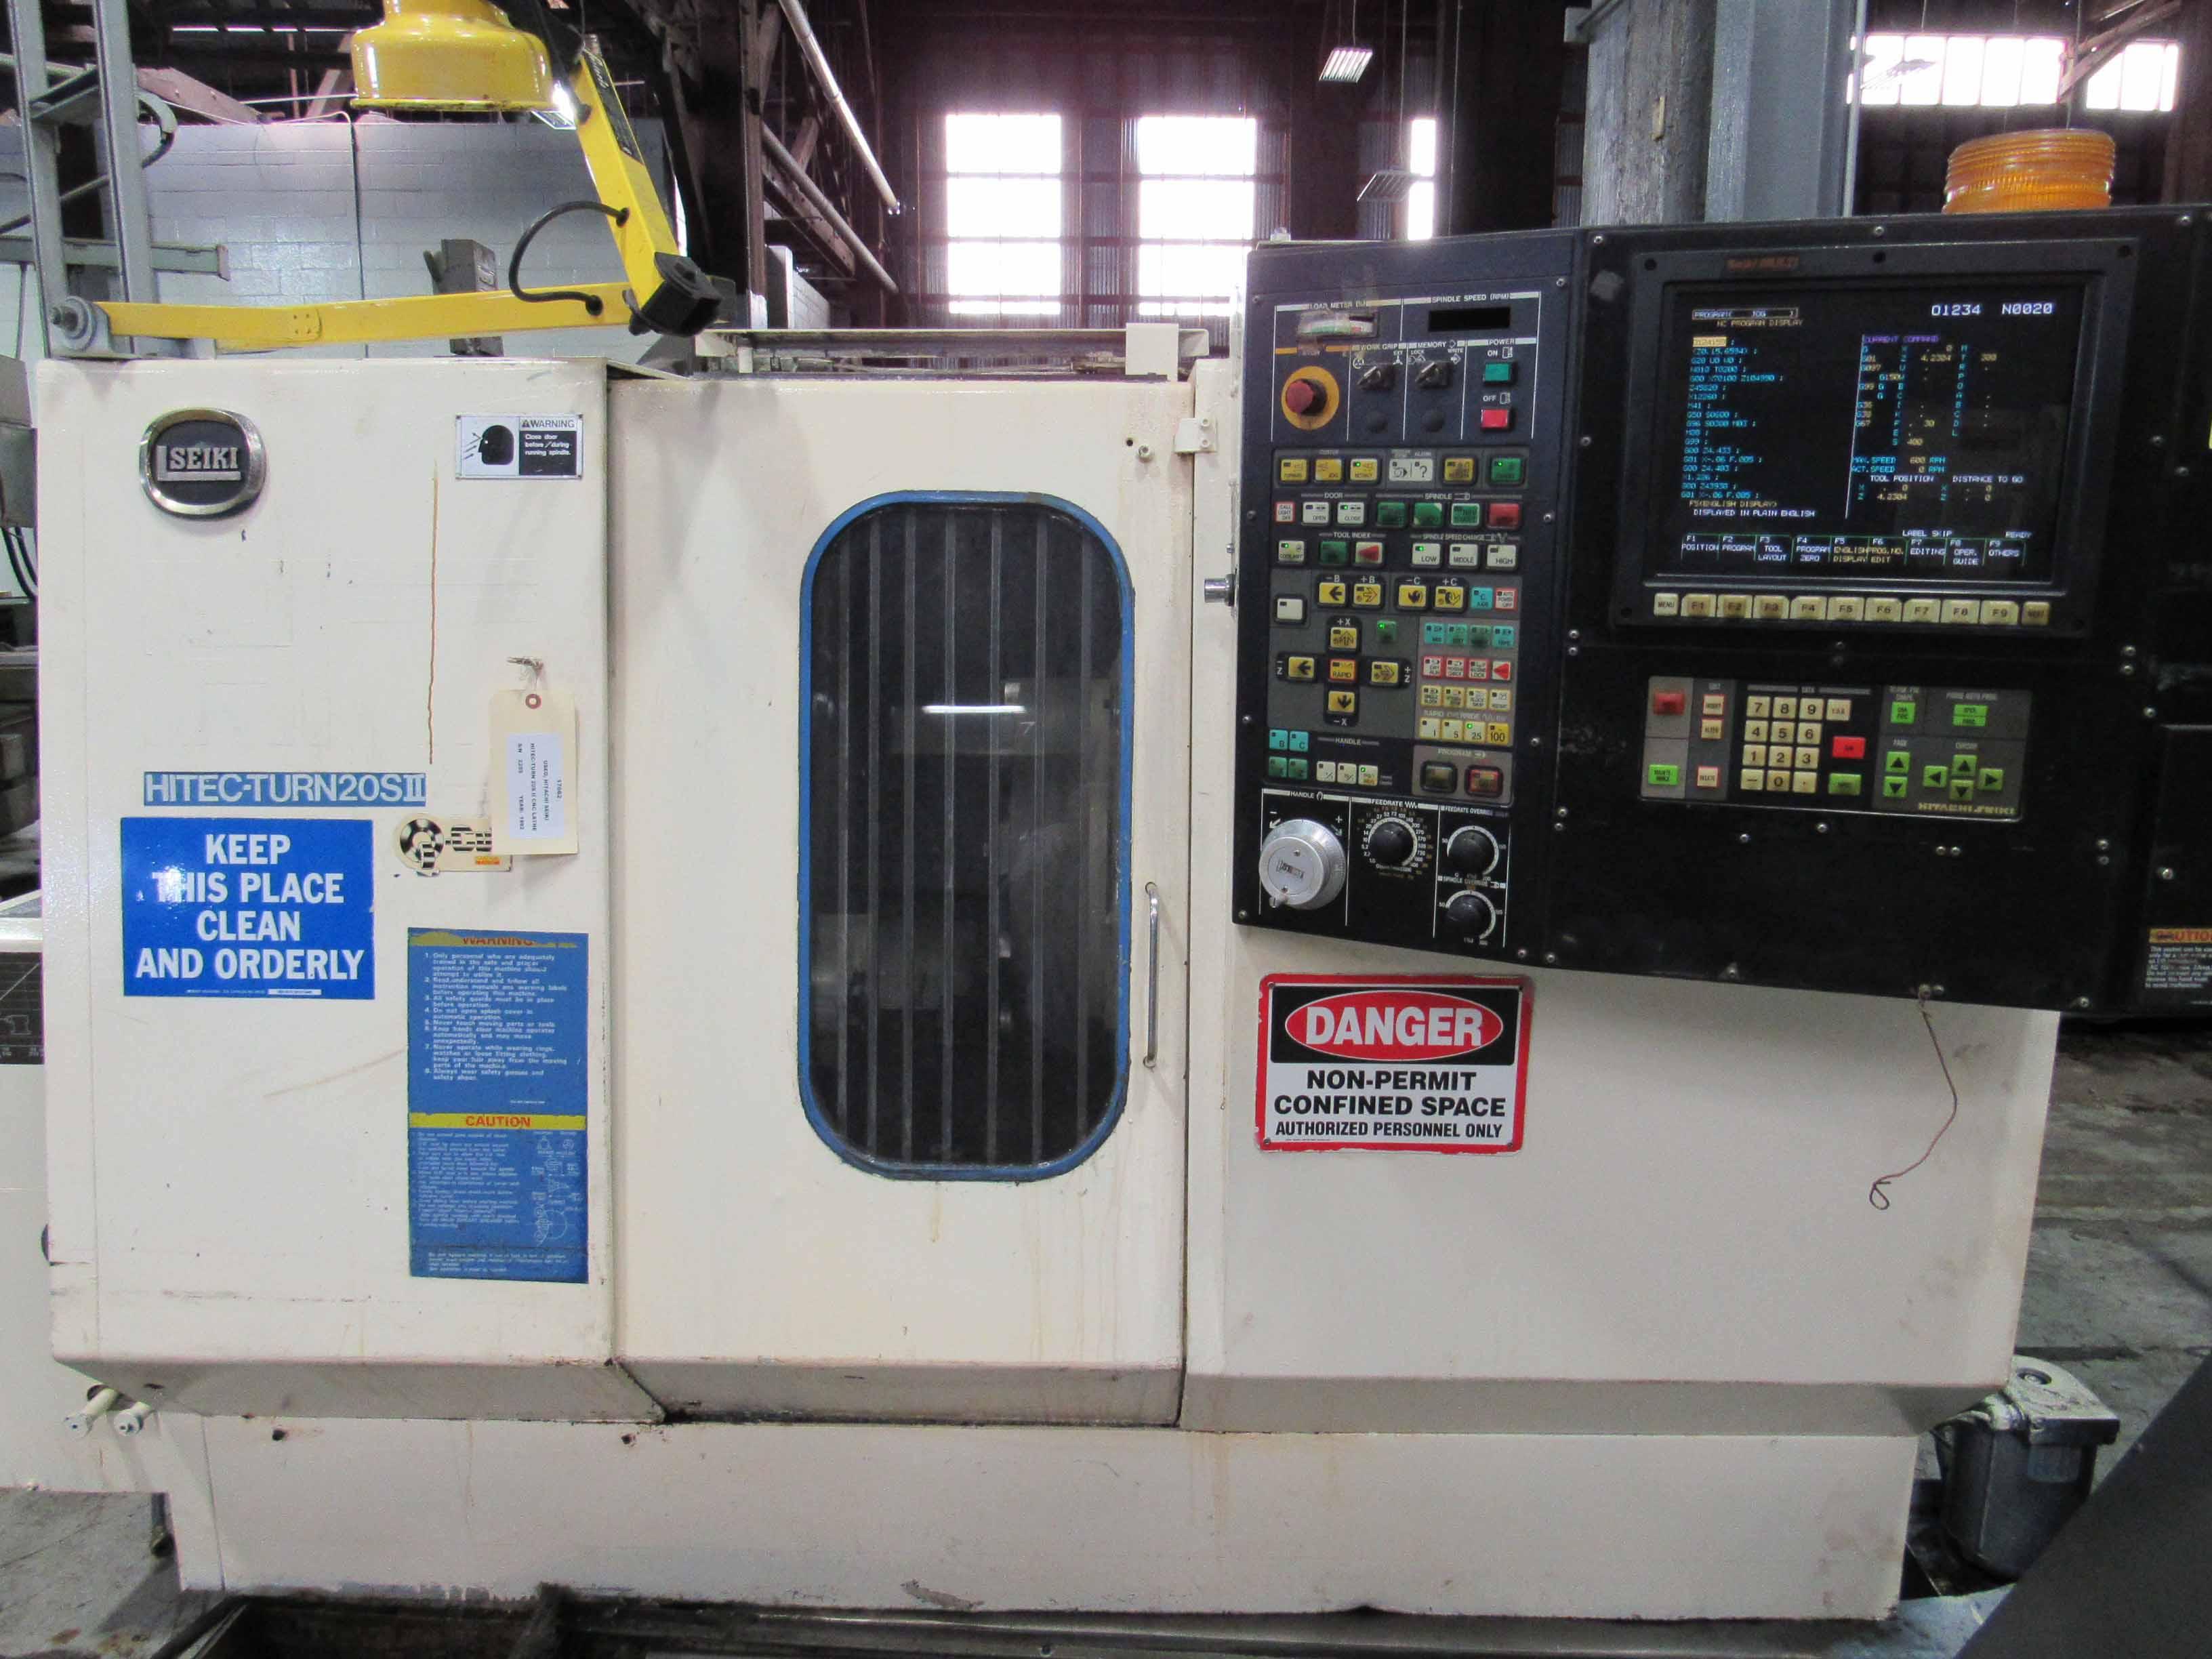 "Lot 53 - HITACHI SEIKI MDL. HITEC-TURN 20S II CNC LATHE, new 1992, Seiki Multi CNC control, 15"" sw. over bed,"